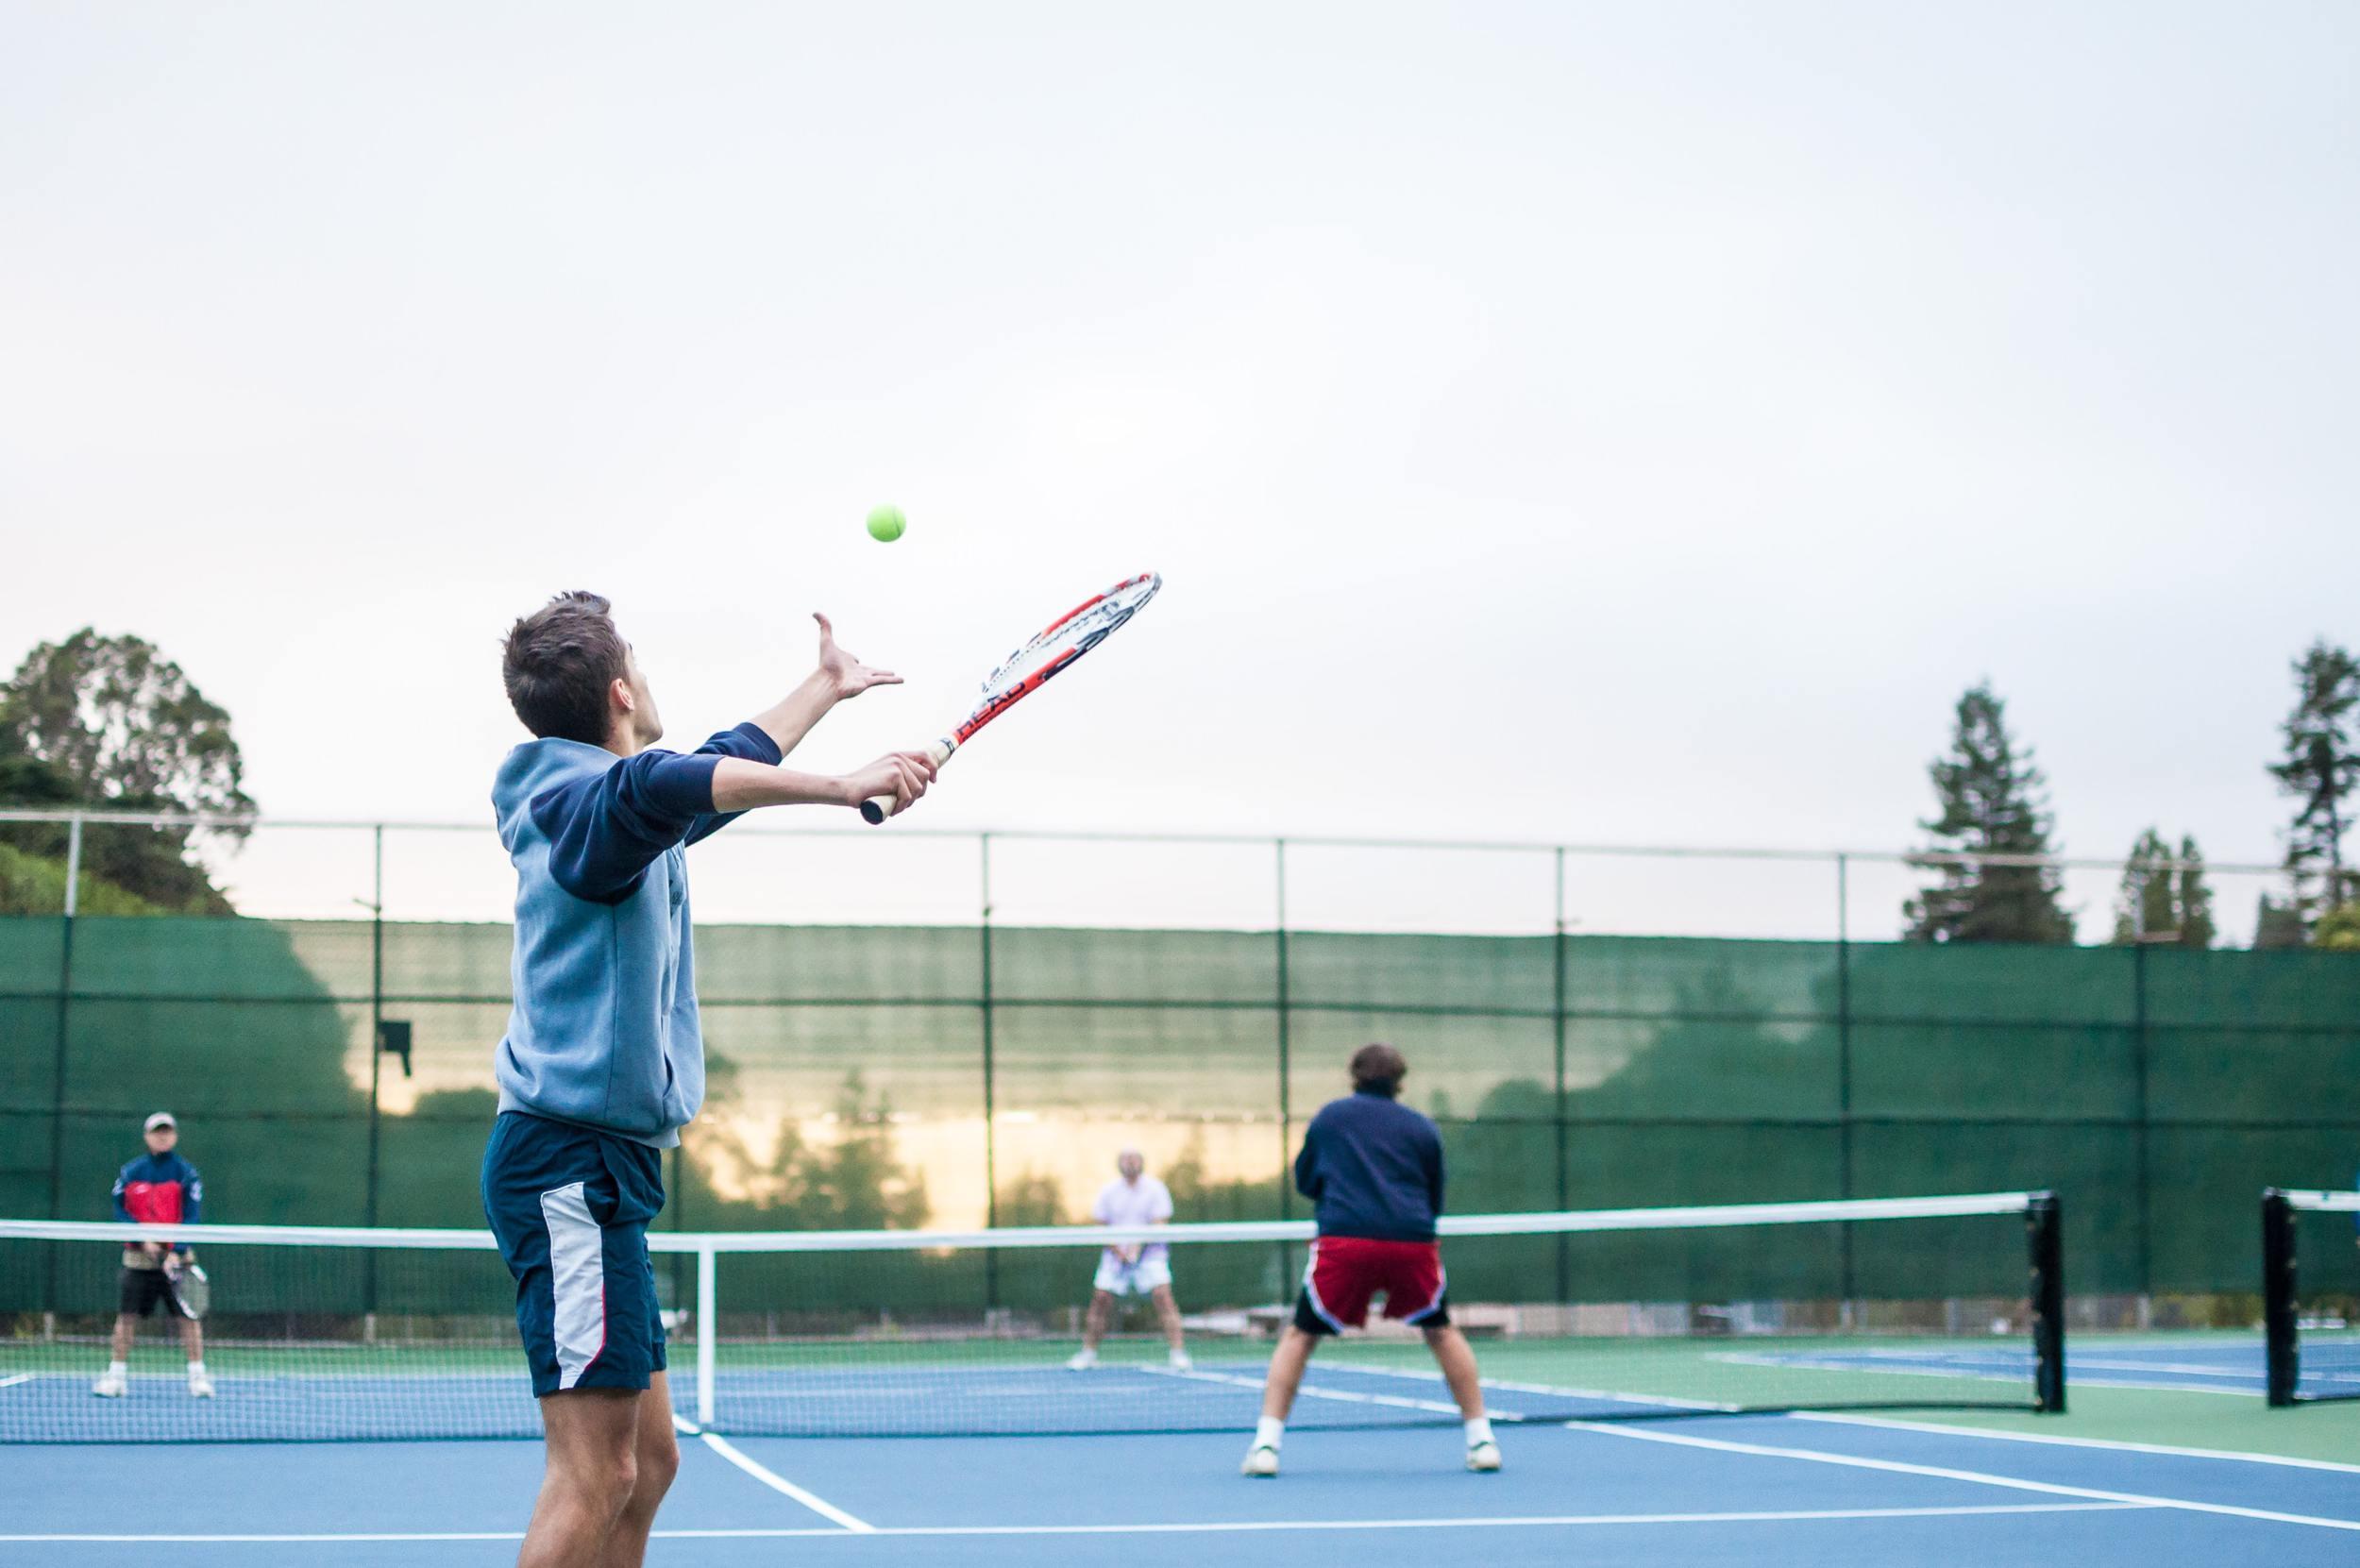 PNW Tennis Center Safety Protocol